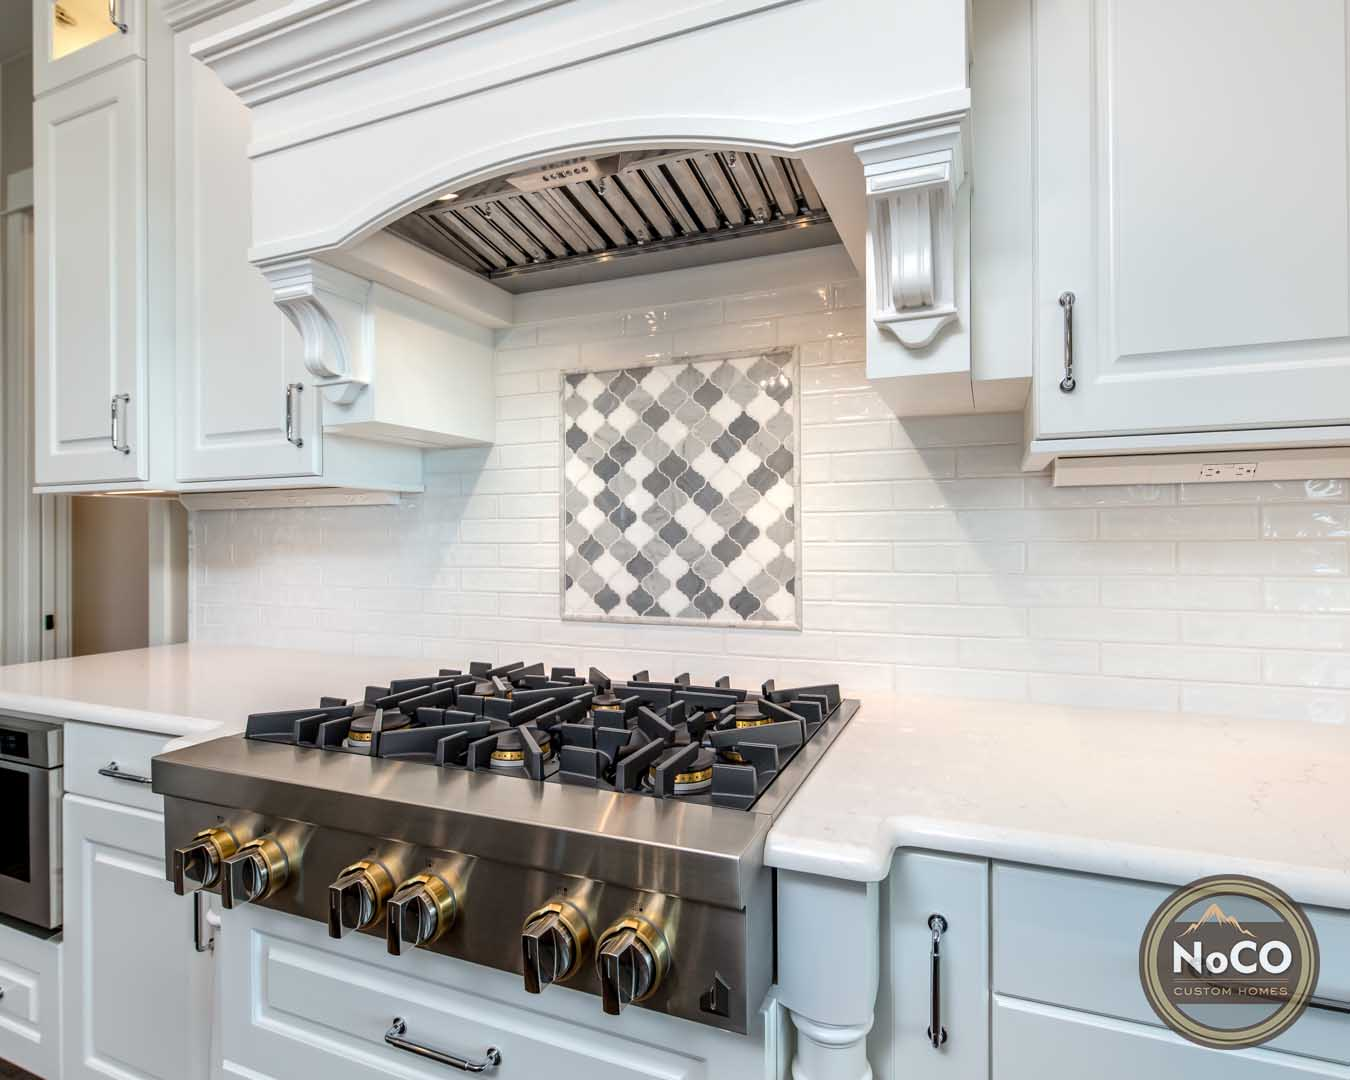 colorado custom home kitchen gas range